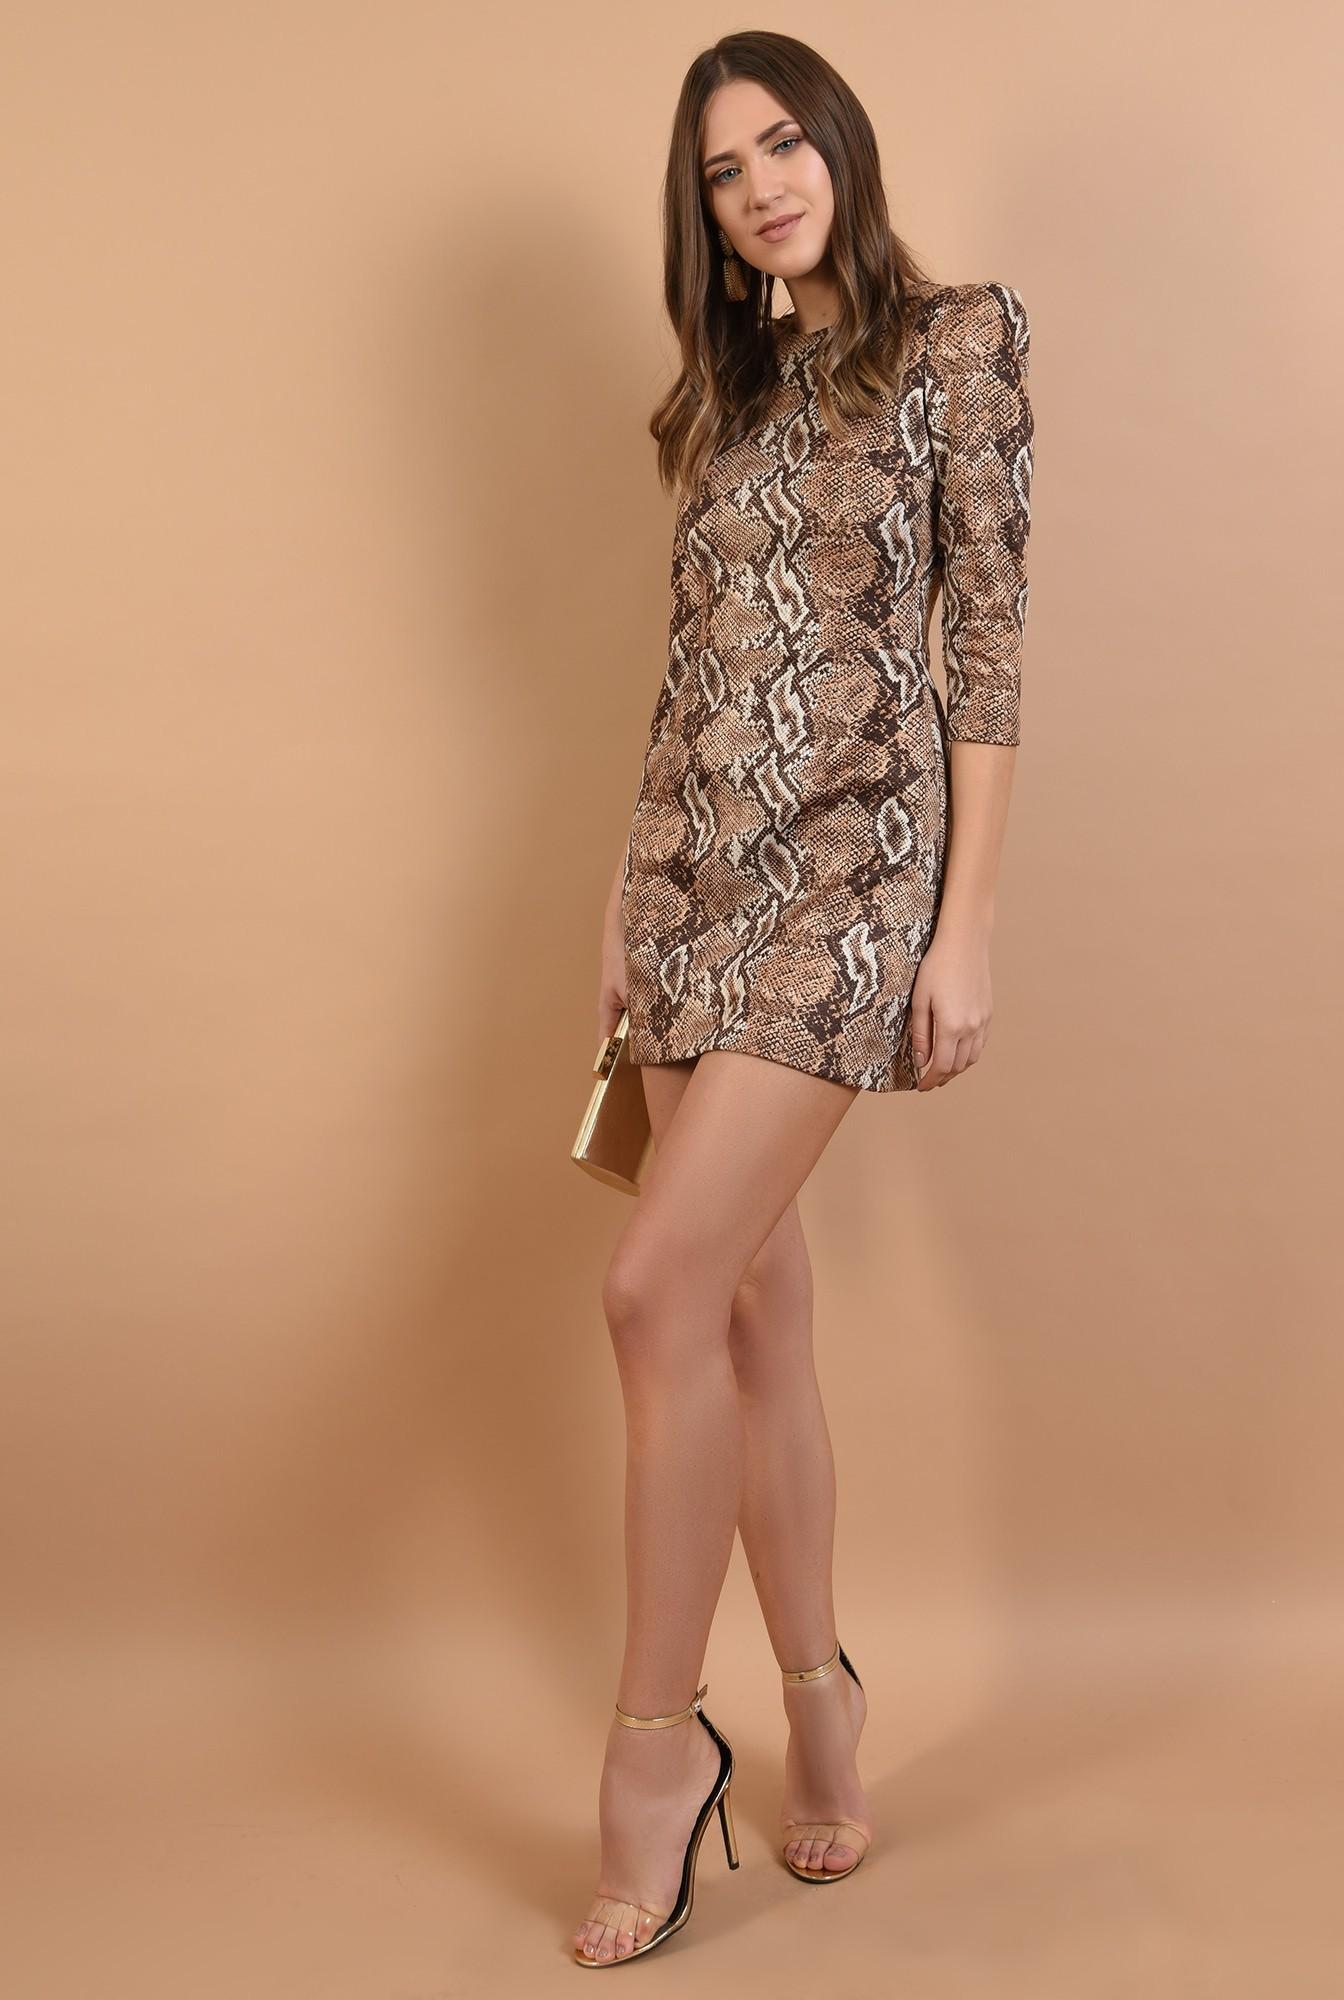 3 - 360 - rochie eleganta, scurta, animal print, maneci midi, cambrata